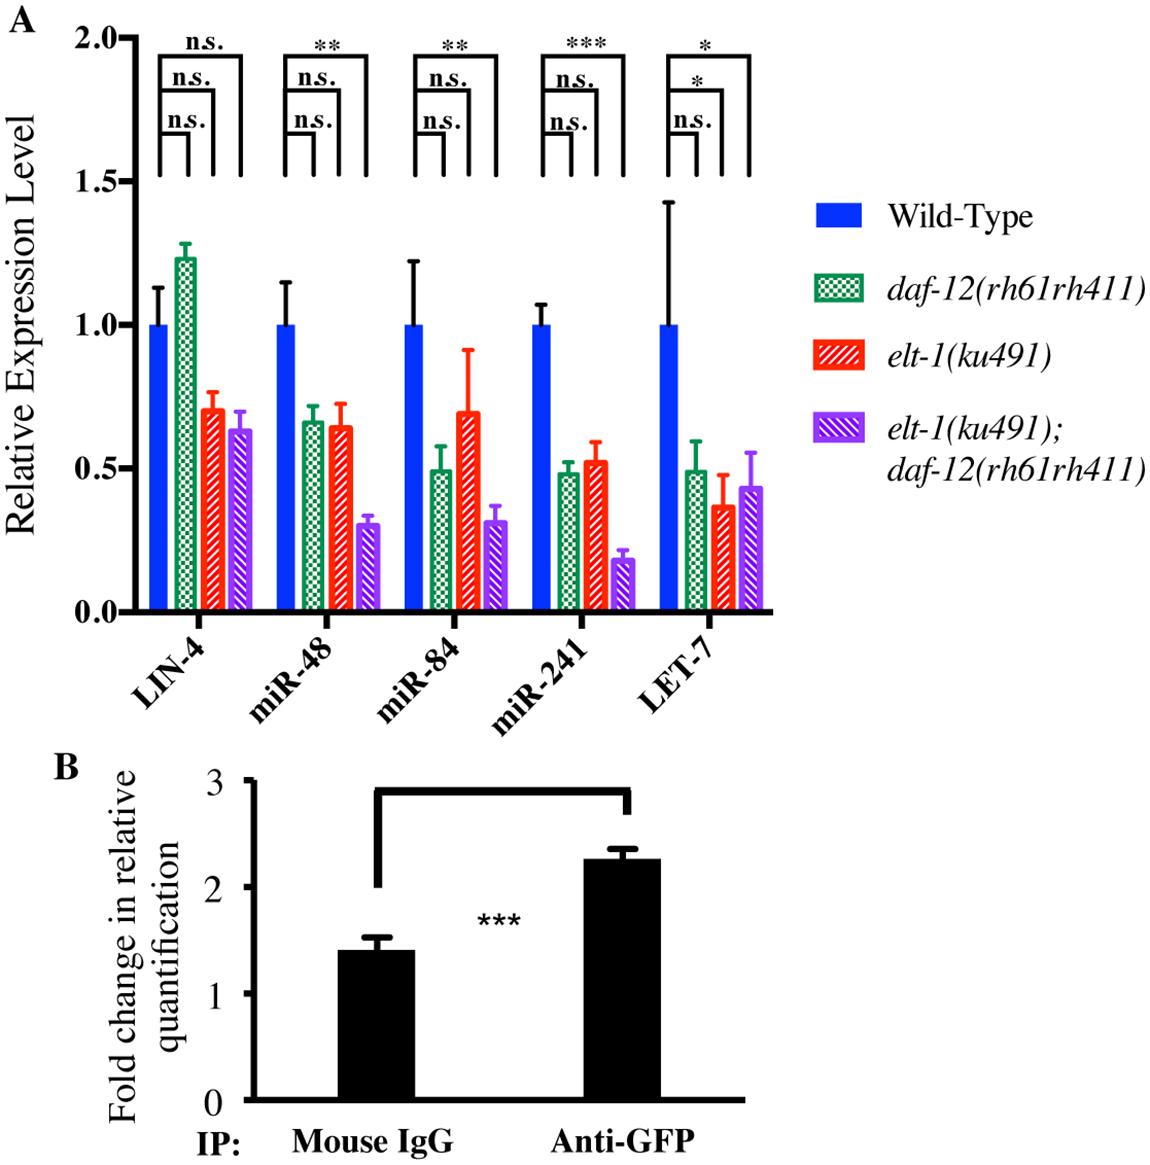 LET-7 family miRNAs are decreased in <i>elt-1(ku491);daf-12(rh61rh411)</i> double-mutant animals and ELT-1 binds to the <i>let-7</i> promoter <i>in vivo</i>.